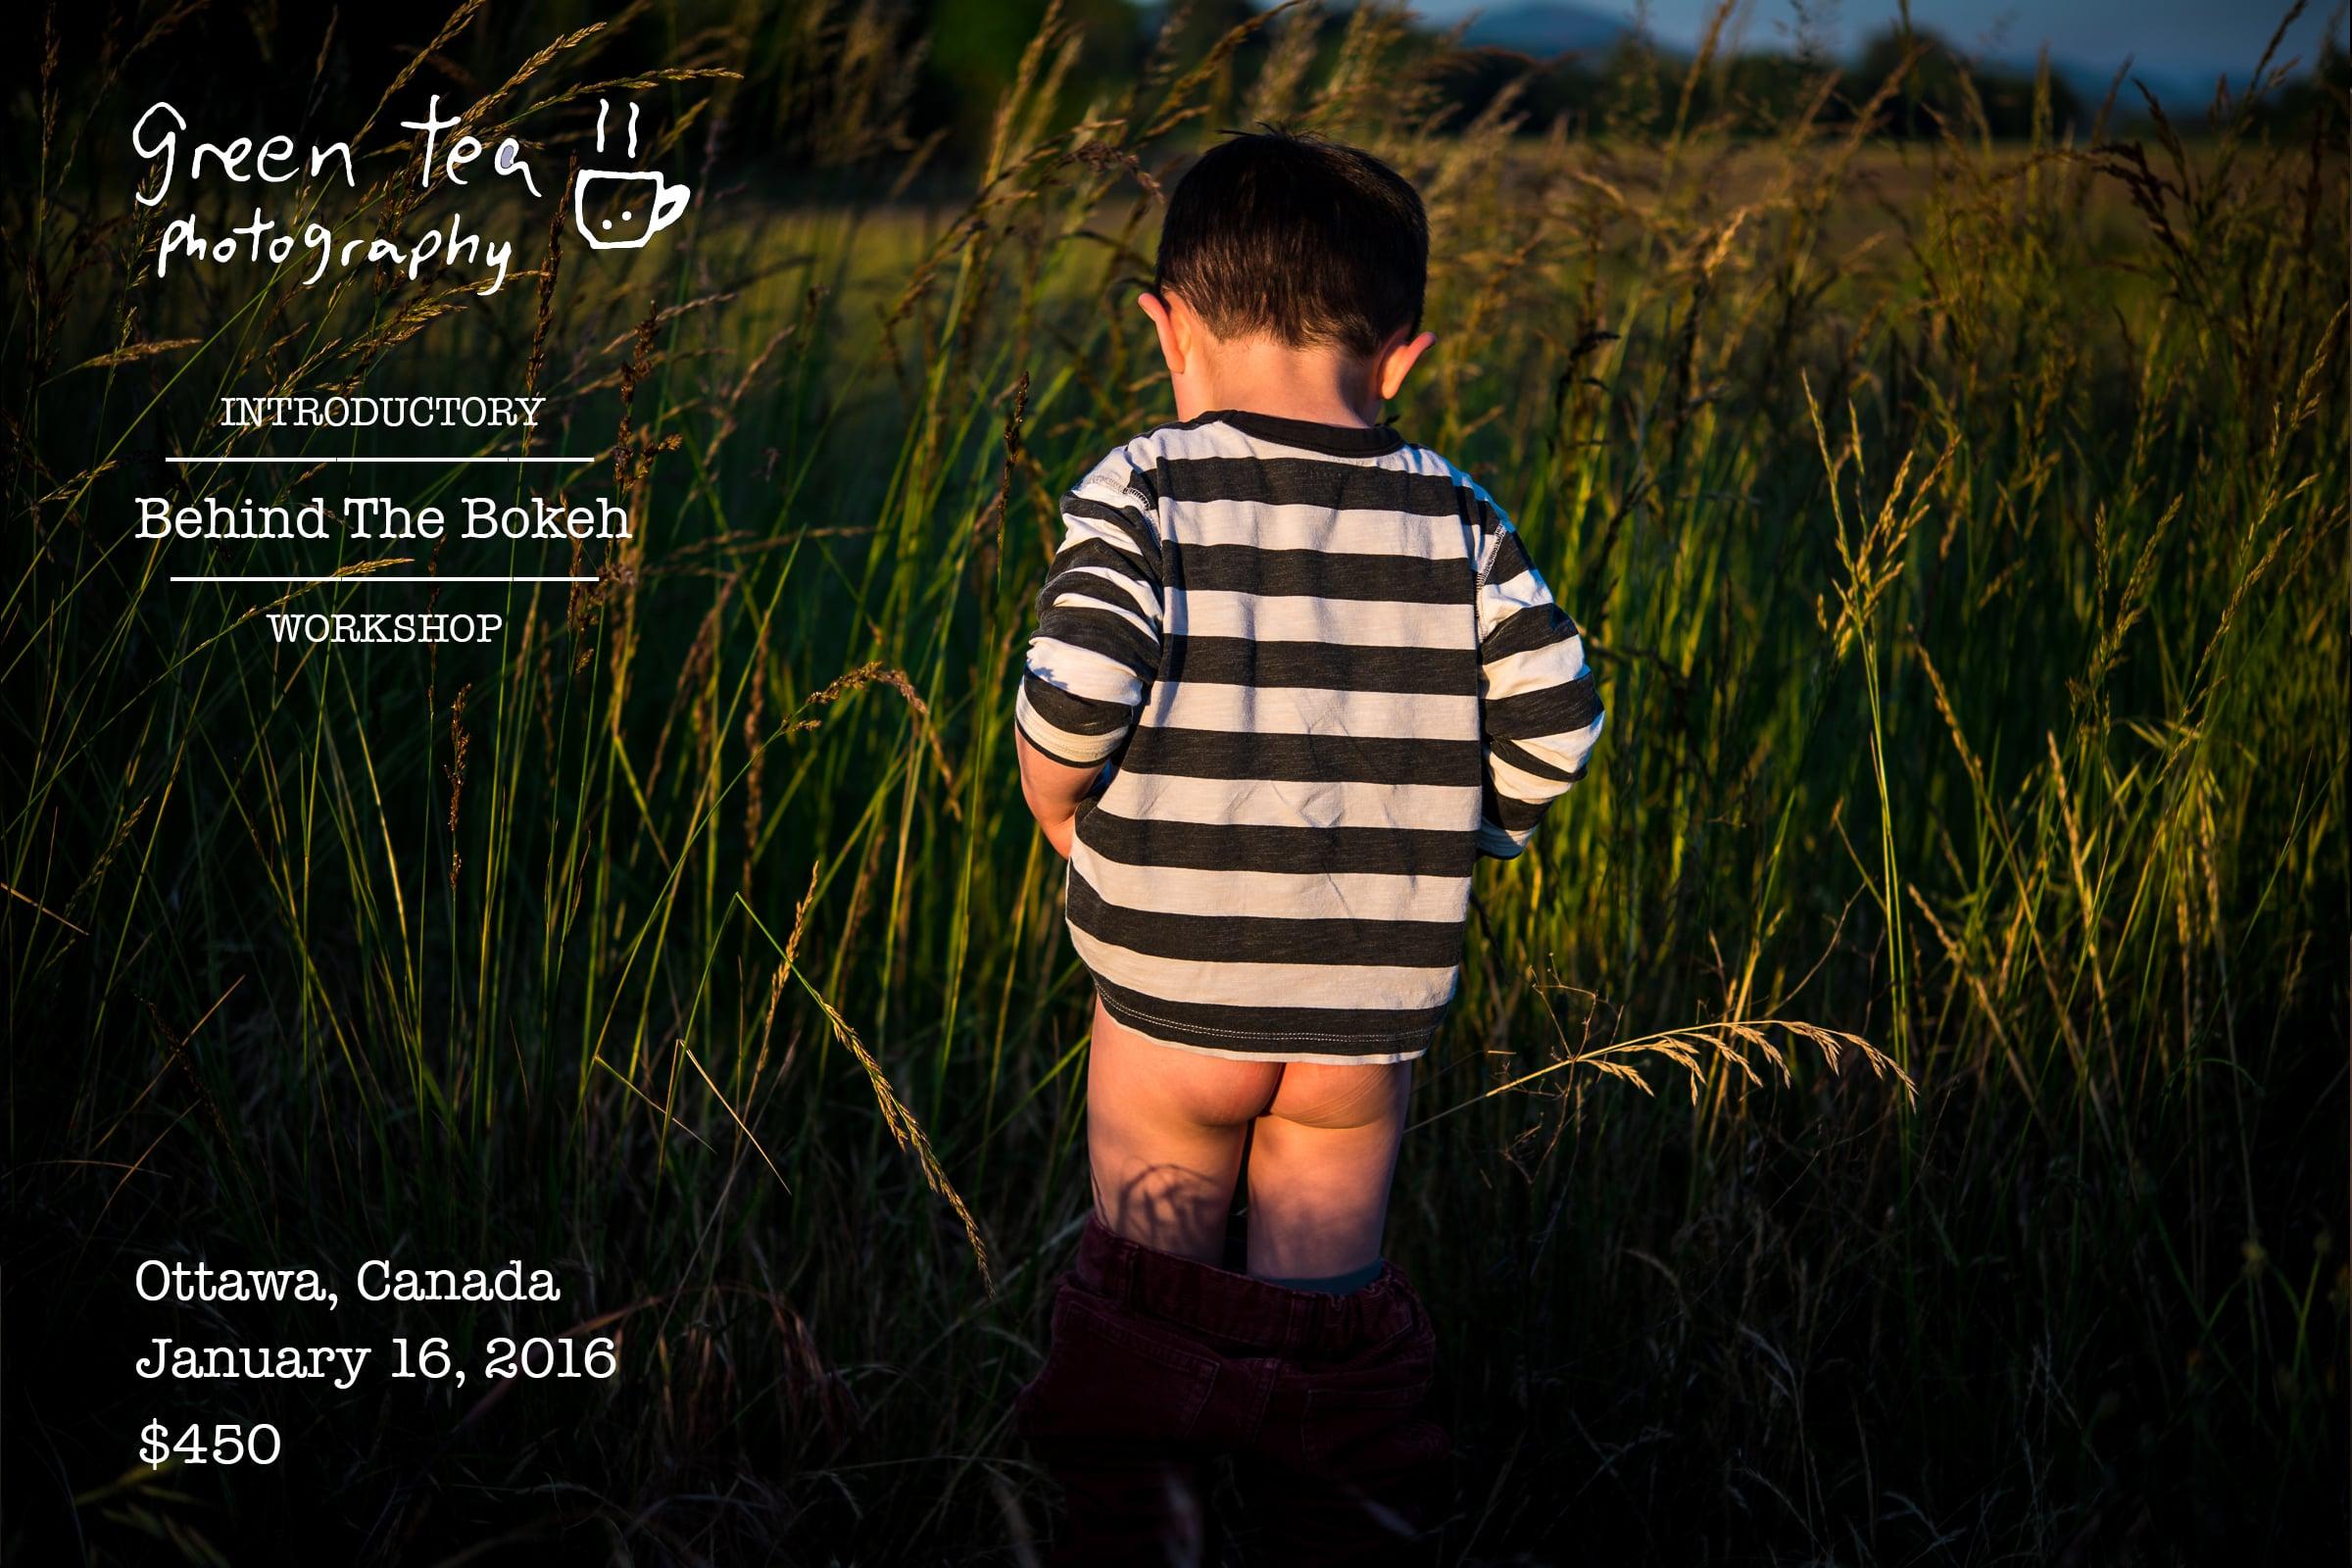 Ottawa Photography Workshop